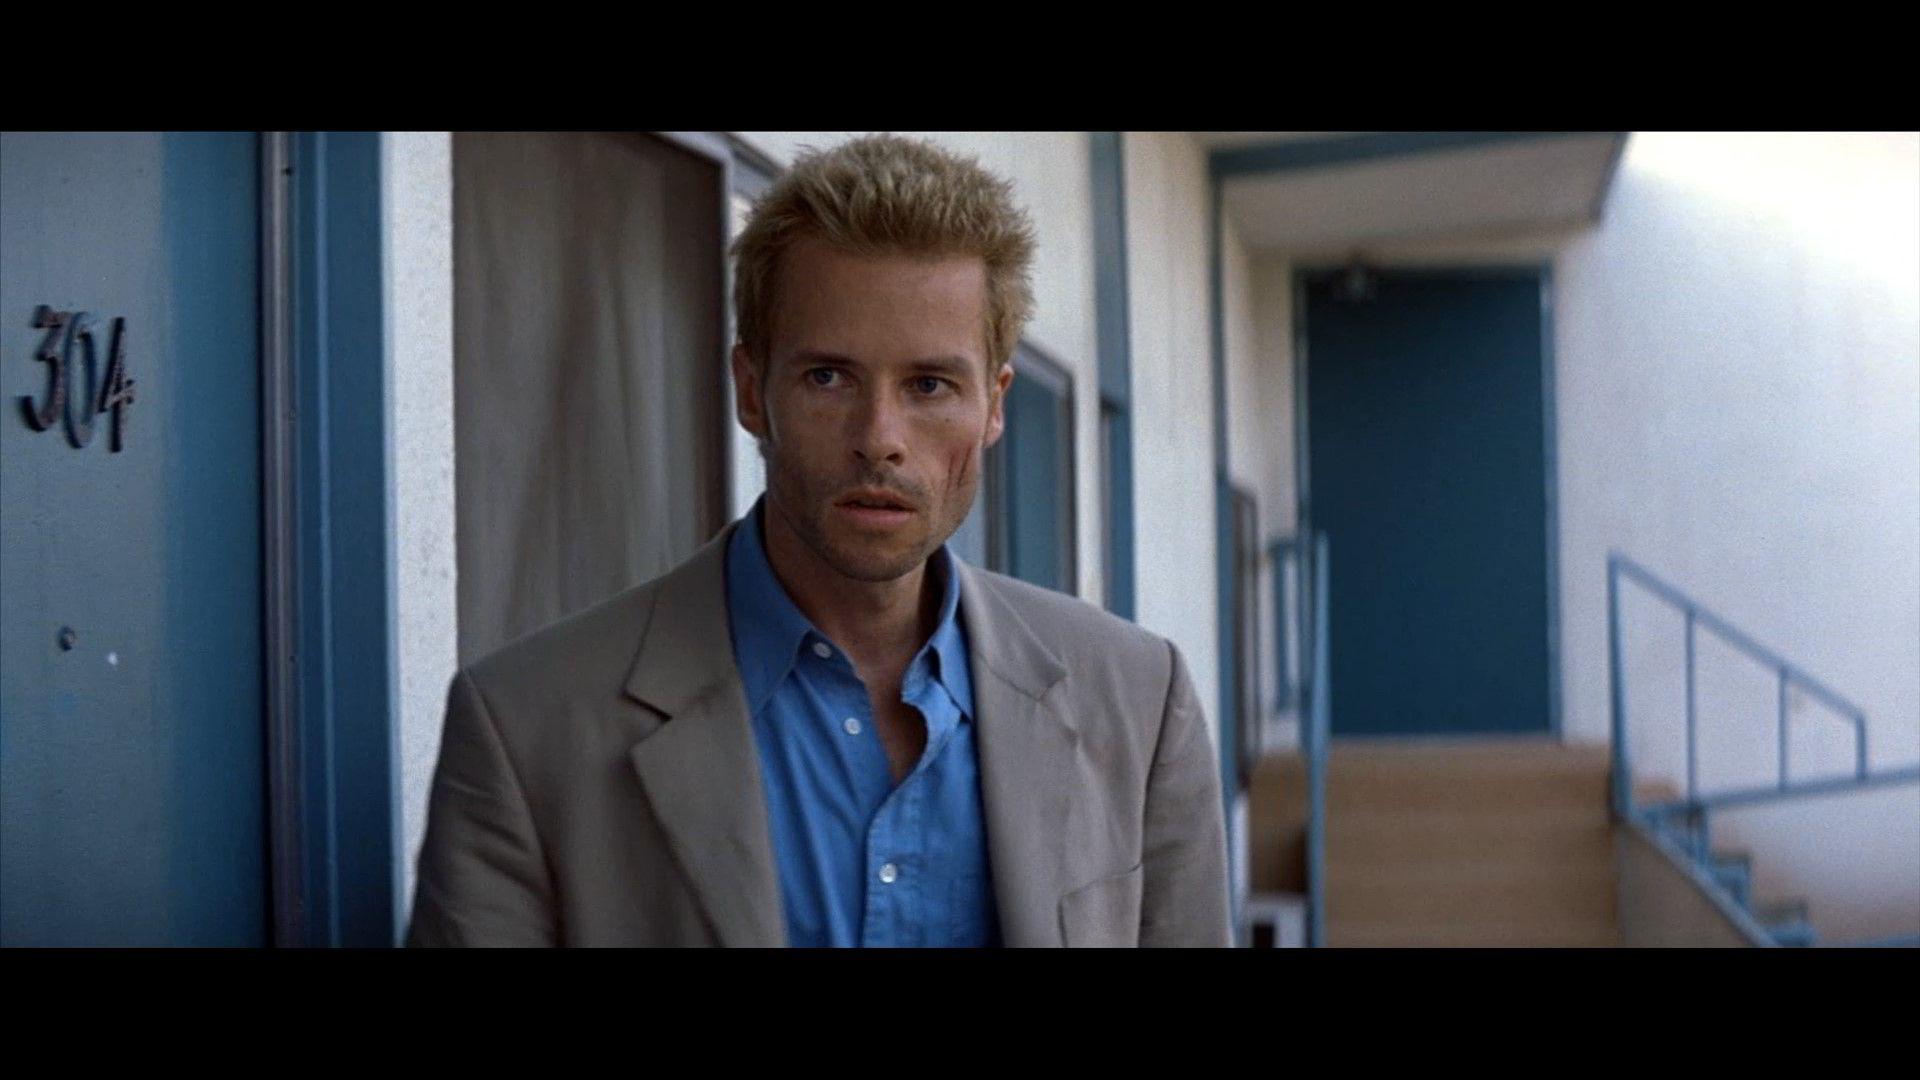 Memento Guy pearce, Guy pearce memento, Good movies on